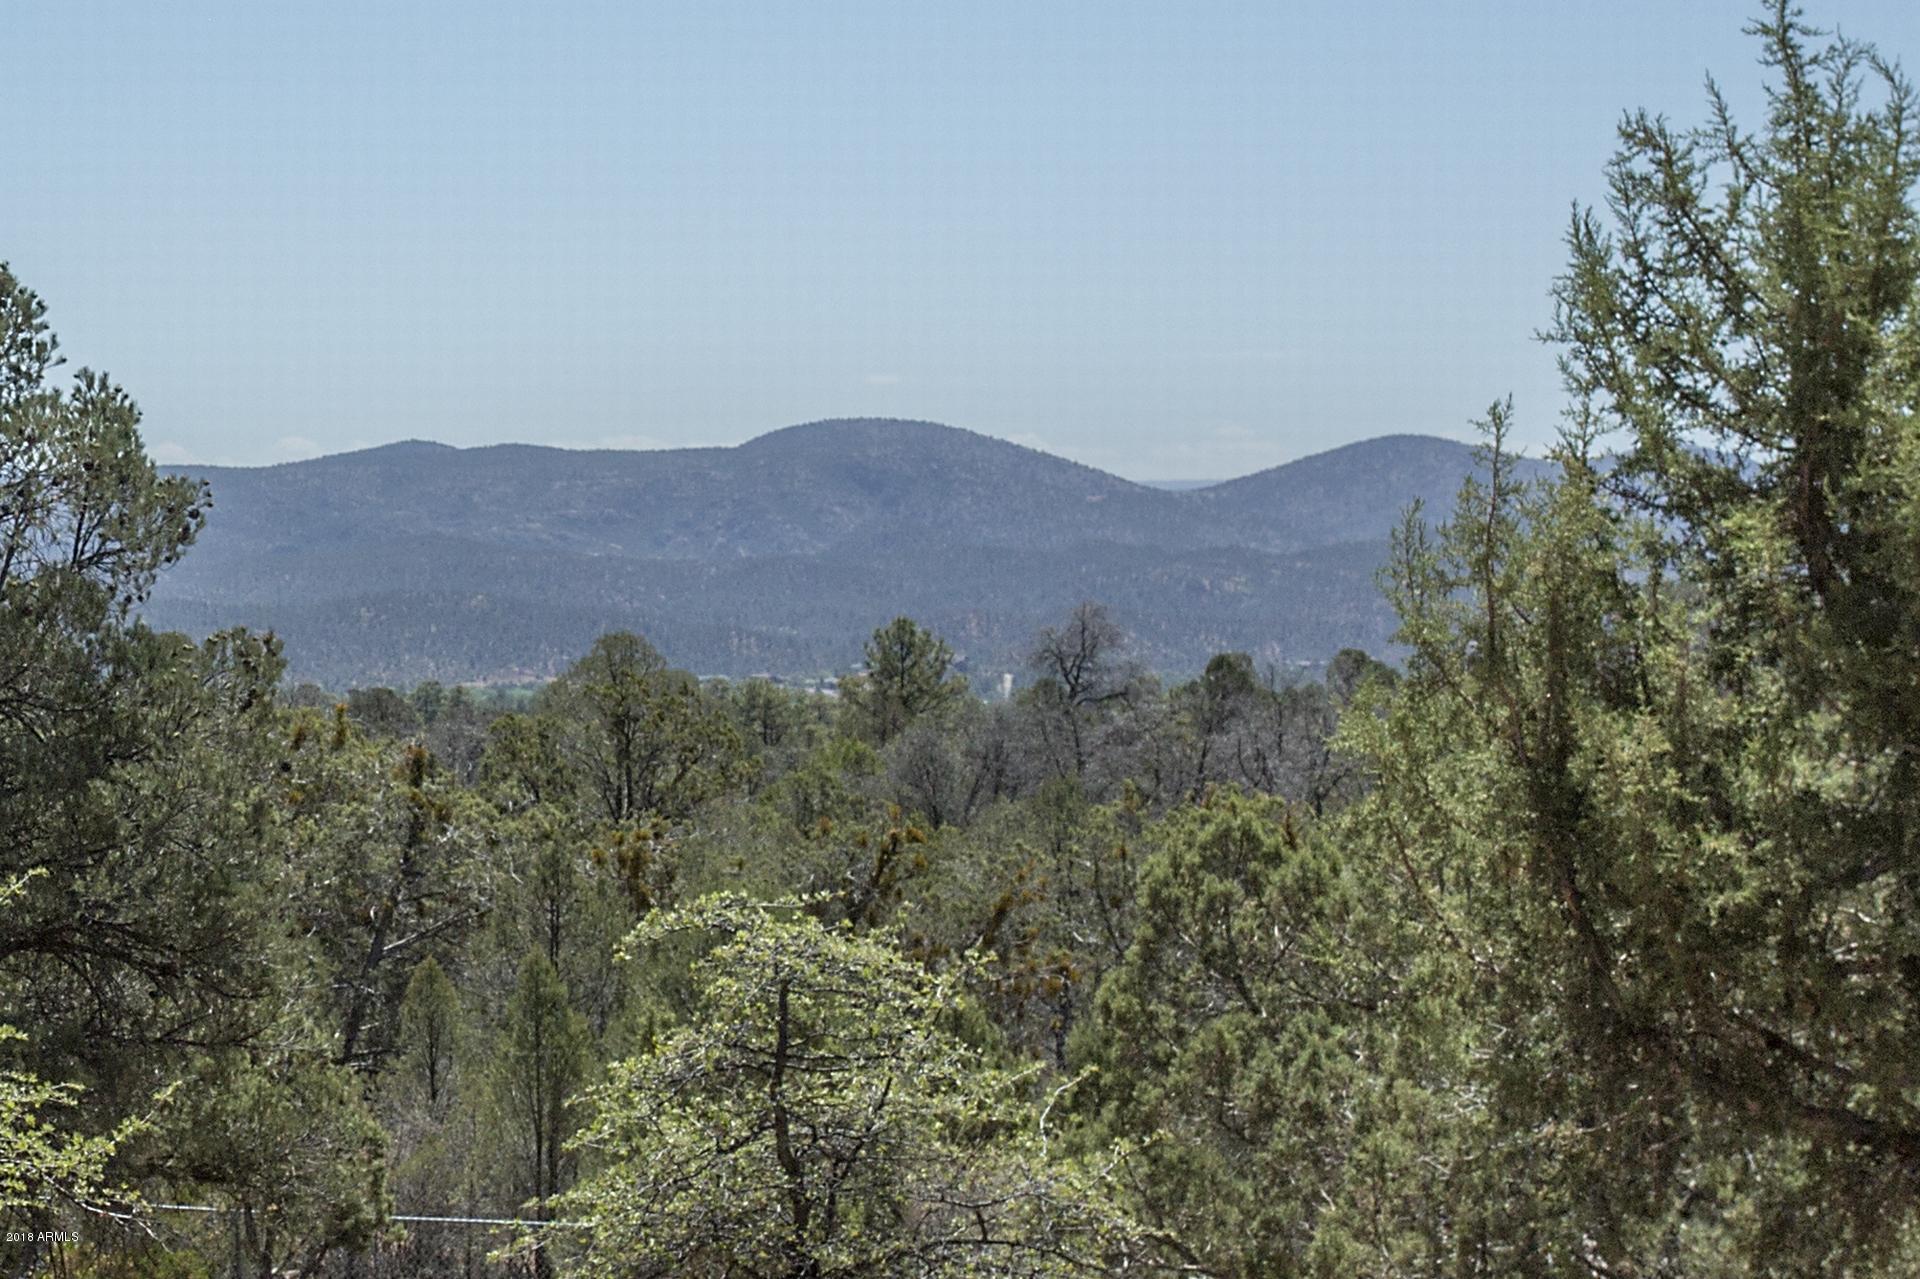 MLS 5786443 Payson Metro Area, Payson, AZ Payson Horse Property for Sale